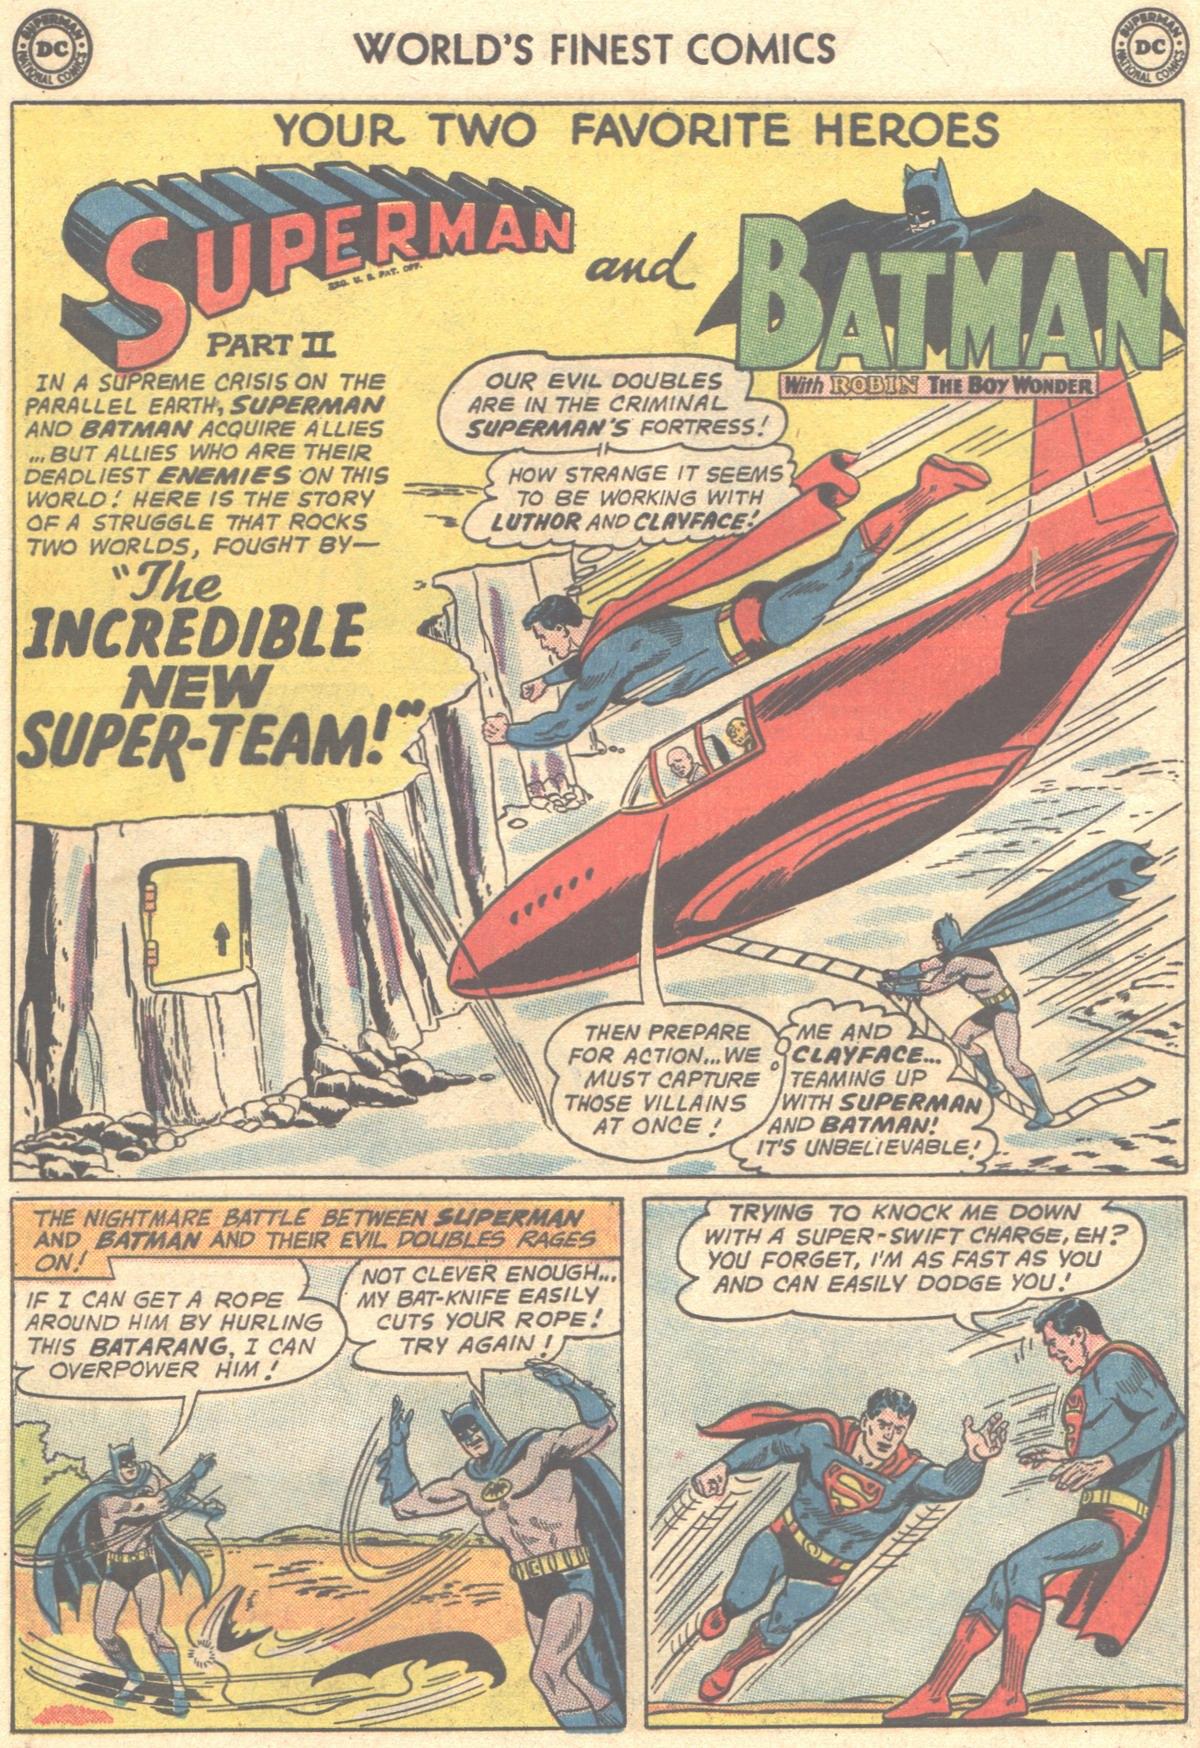 Read online World's Finest Comics comic -  Issue #148 - 12